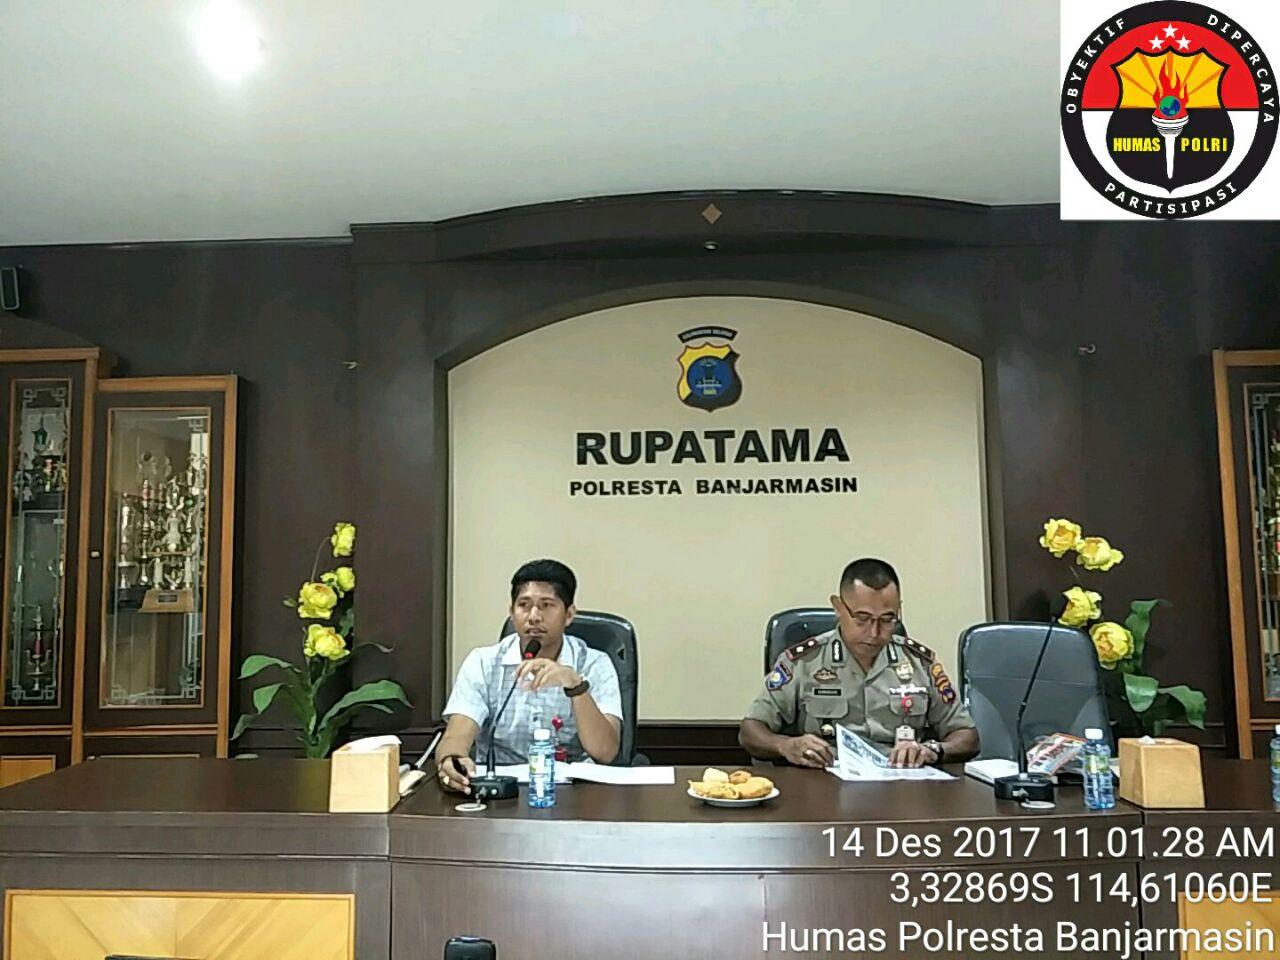 Polresta Banjarmasin Gelar Sosialisasi Saber Pungli Kepada Seluruh Personel Bhabinkamtibmas